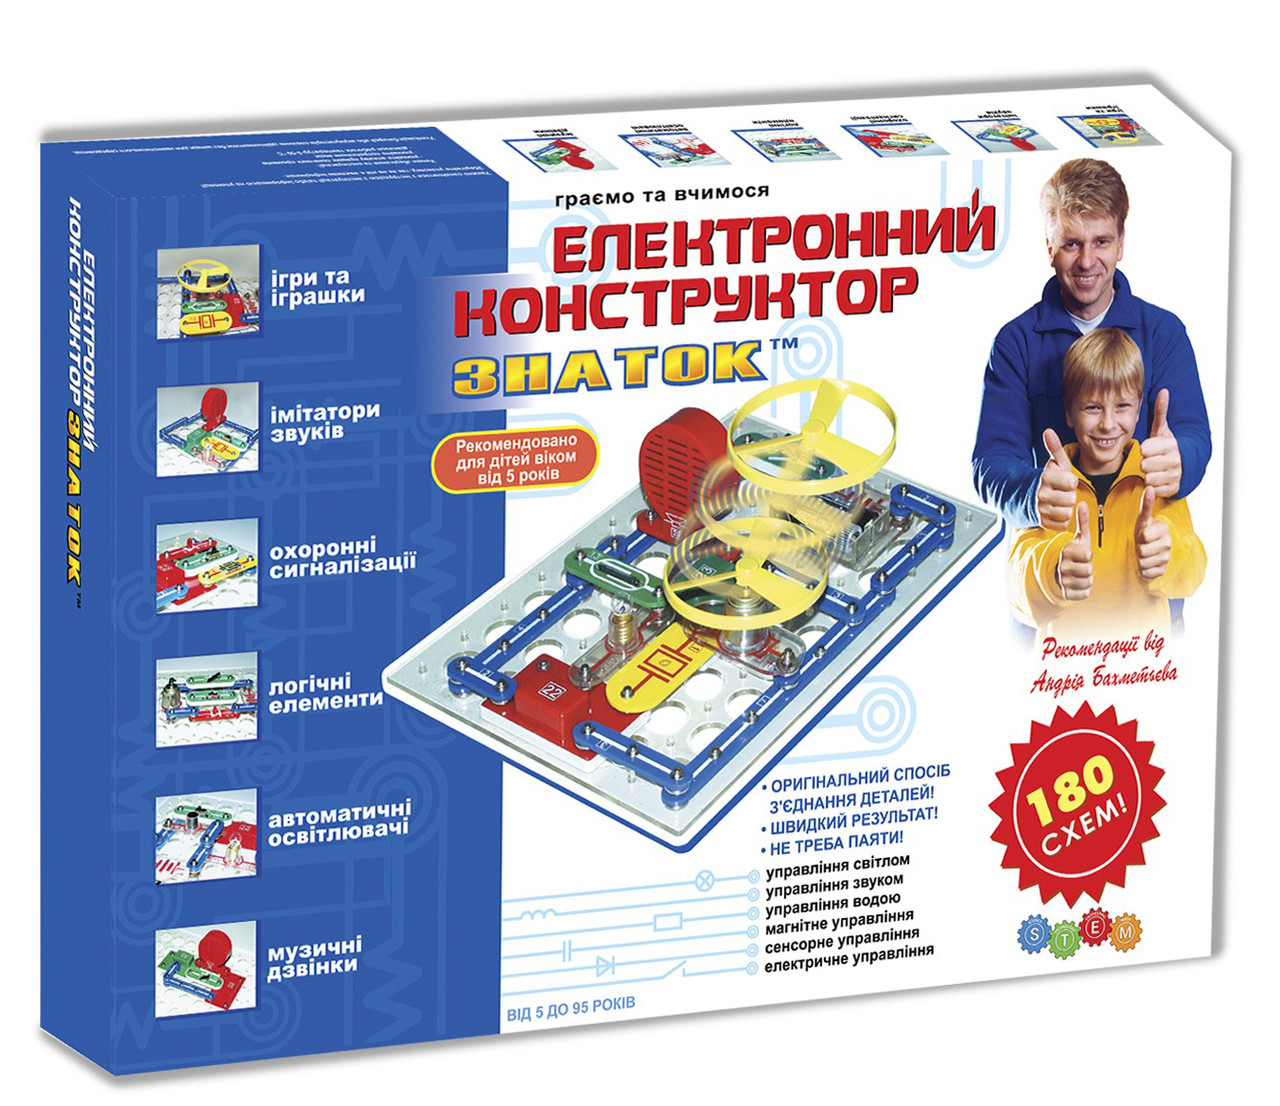 Конструктор ЗНАВЕЦЬ (180 схем) Kiddisvit арт. REW-K003